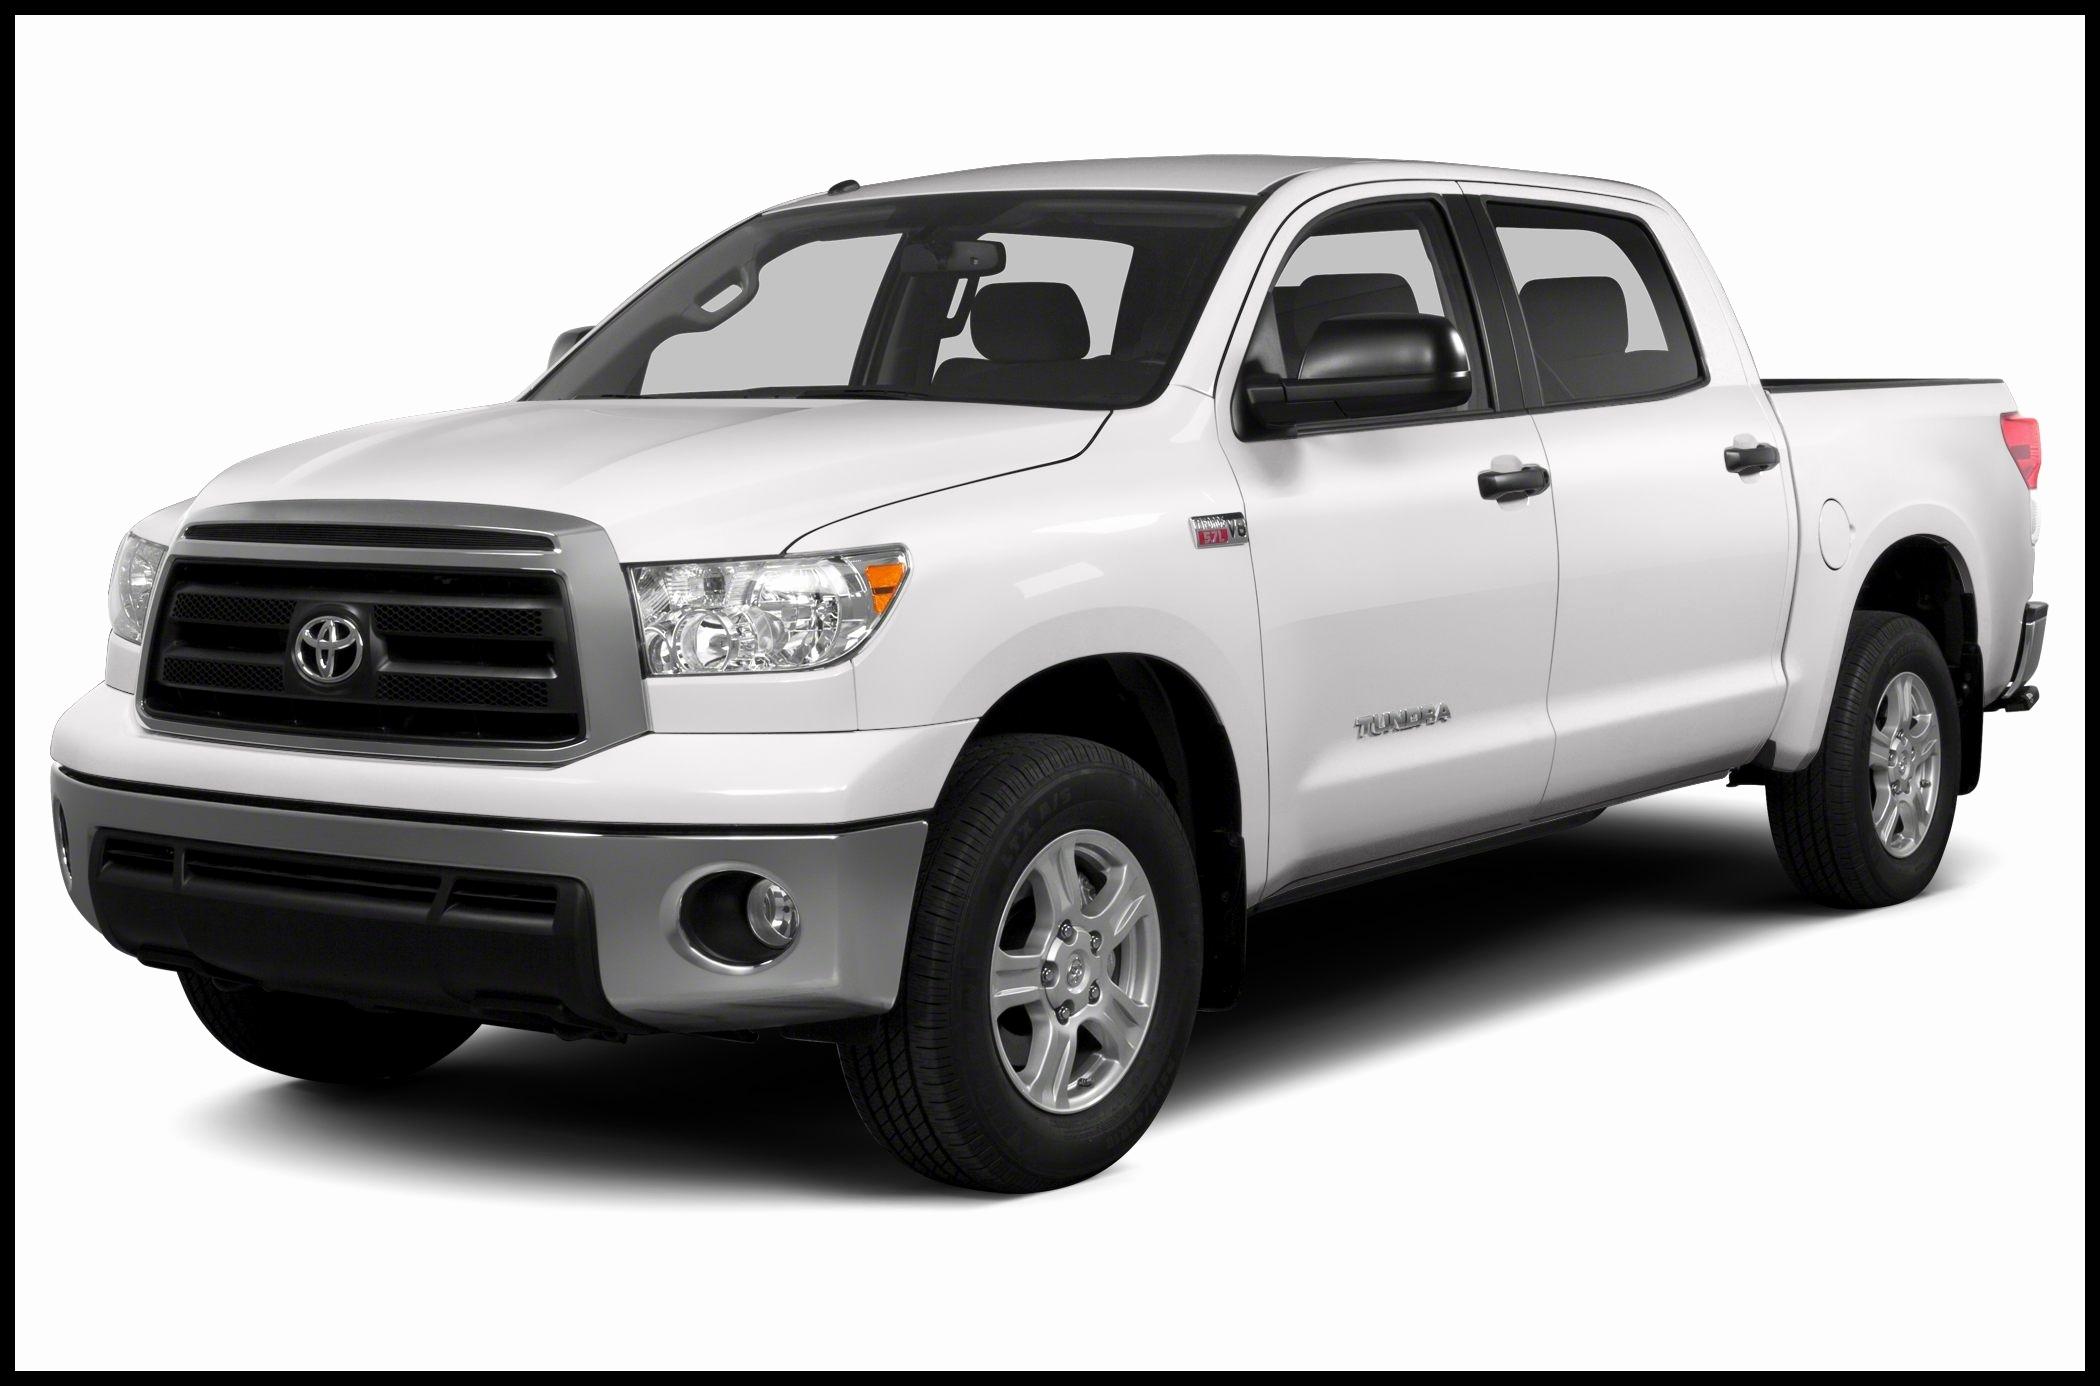 2013 Toyota Tundra Platinum 5 7L V8 4x4 Crew Max 5 6 ft box 145 7